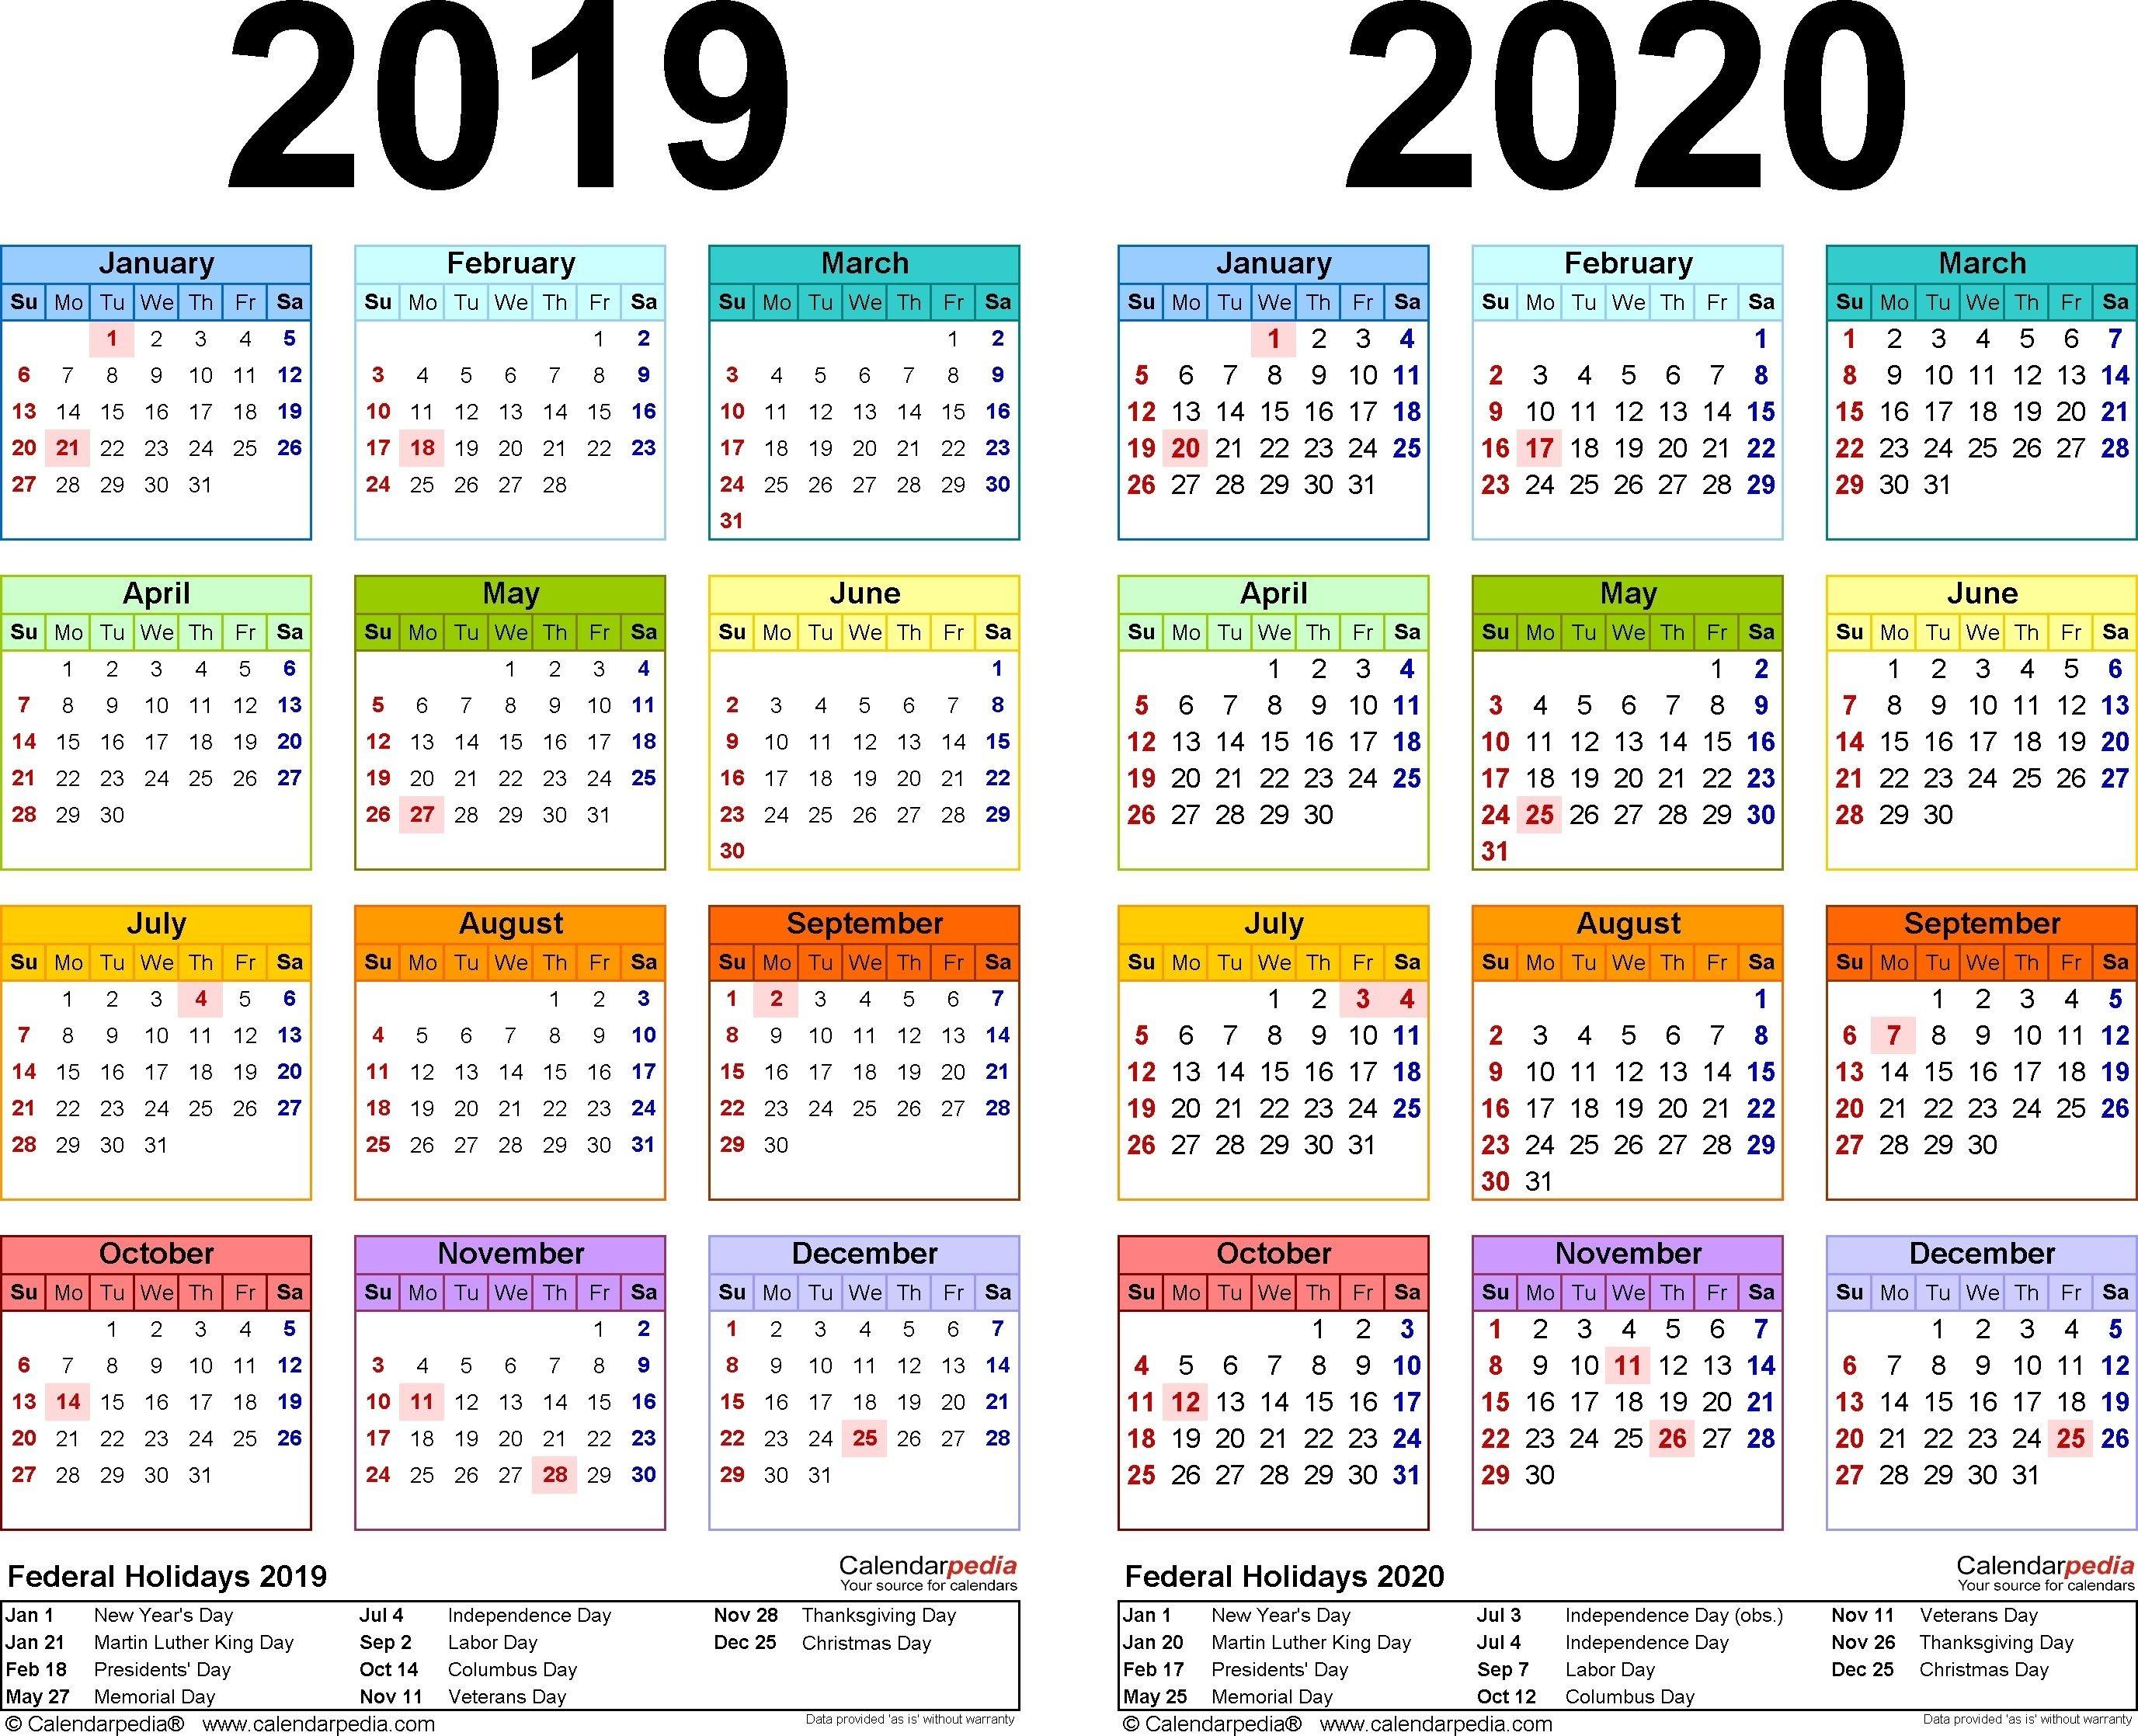 2019-2020 Calendar - Free Printable Two-Year Excel Calendars-Monthly Bill Calendar 2020